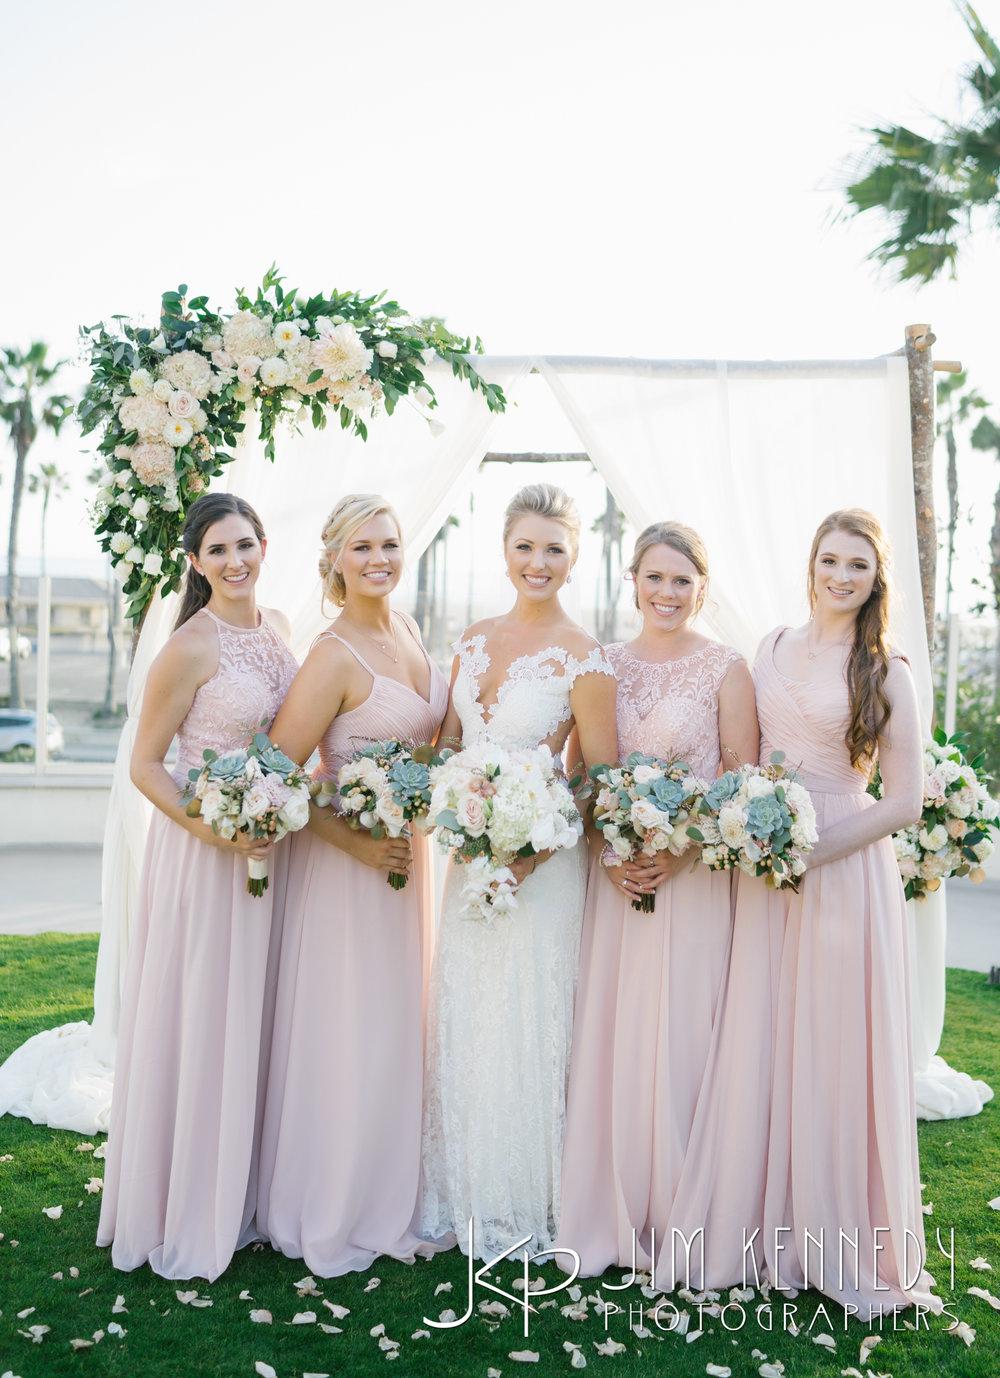 hyatt-huntington-beach-wedding-161.JPG